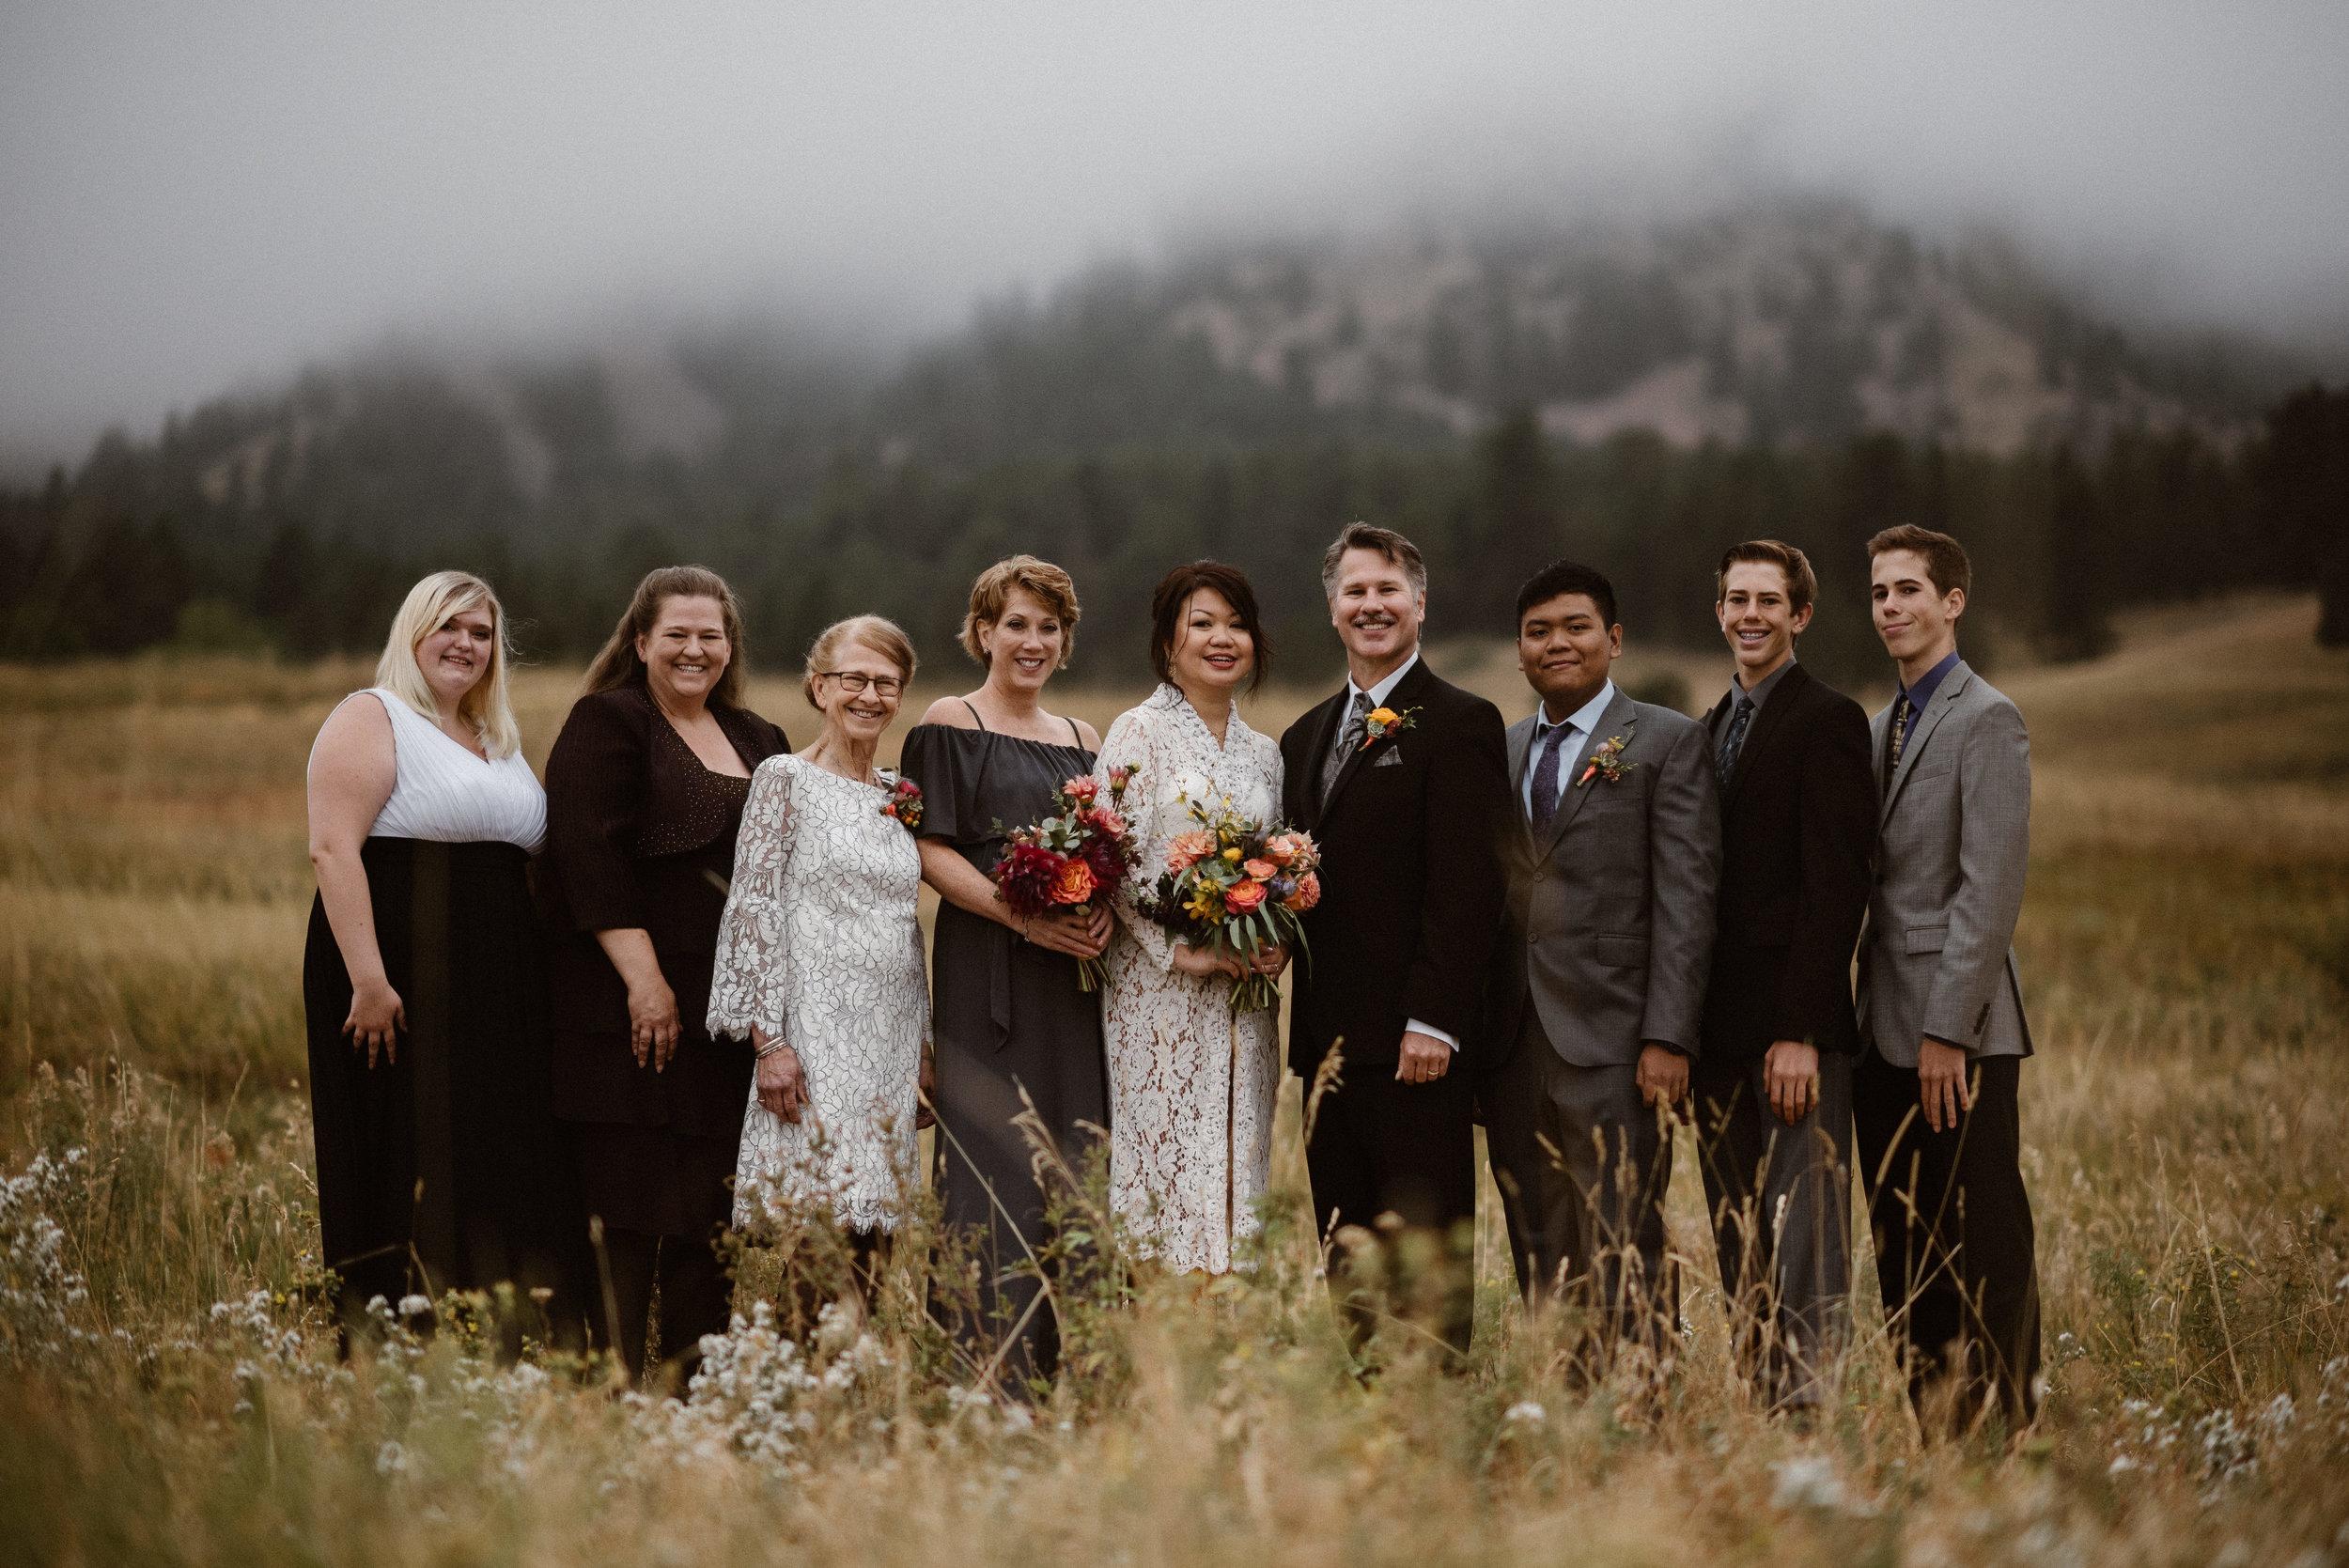 Chautauqua Park Wedding in Boulder, Colorado